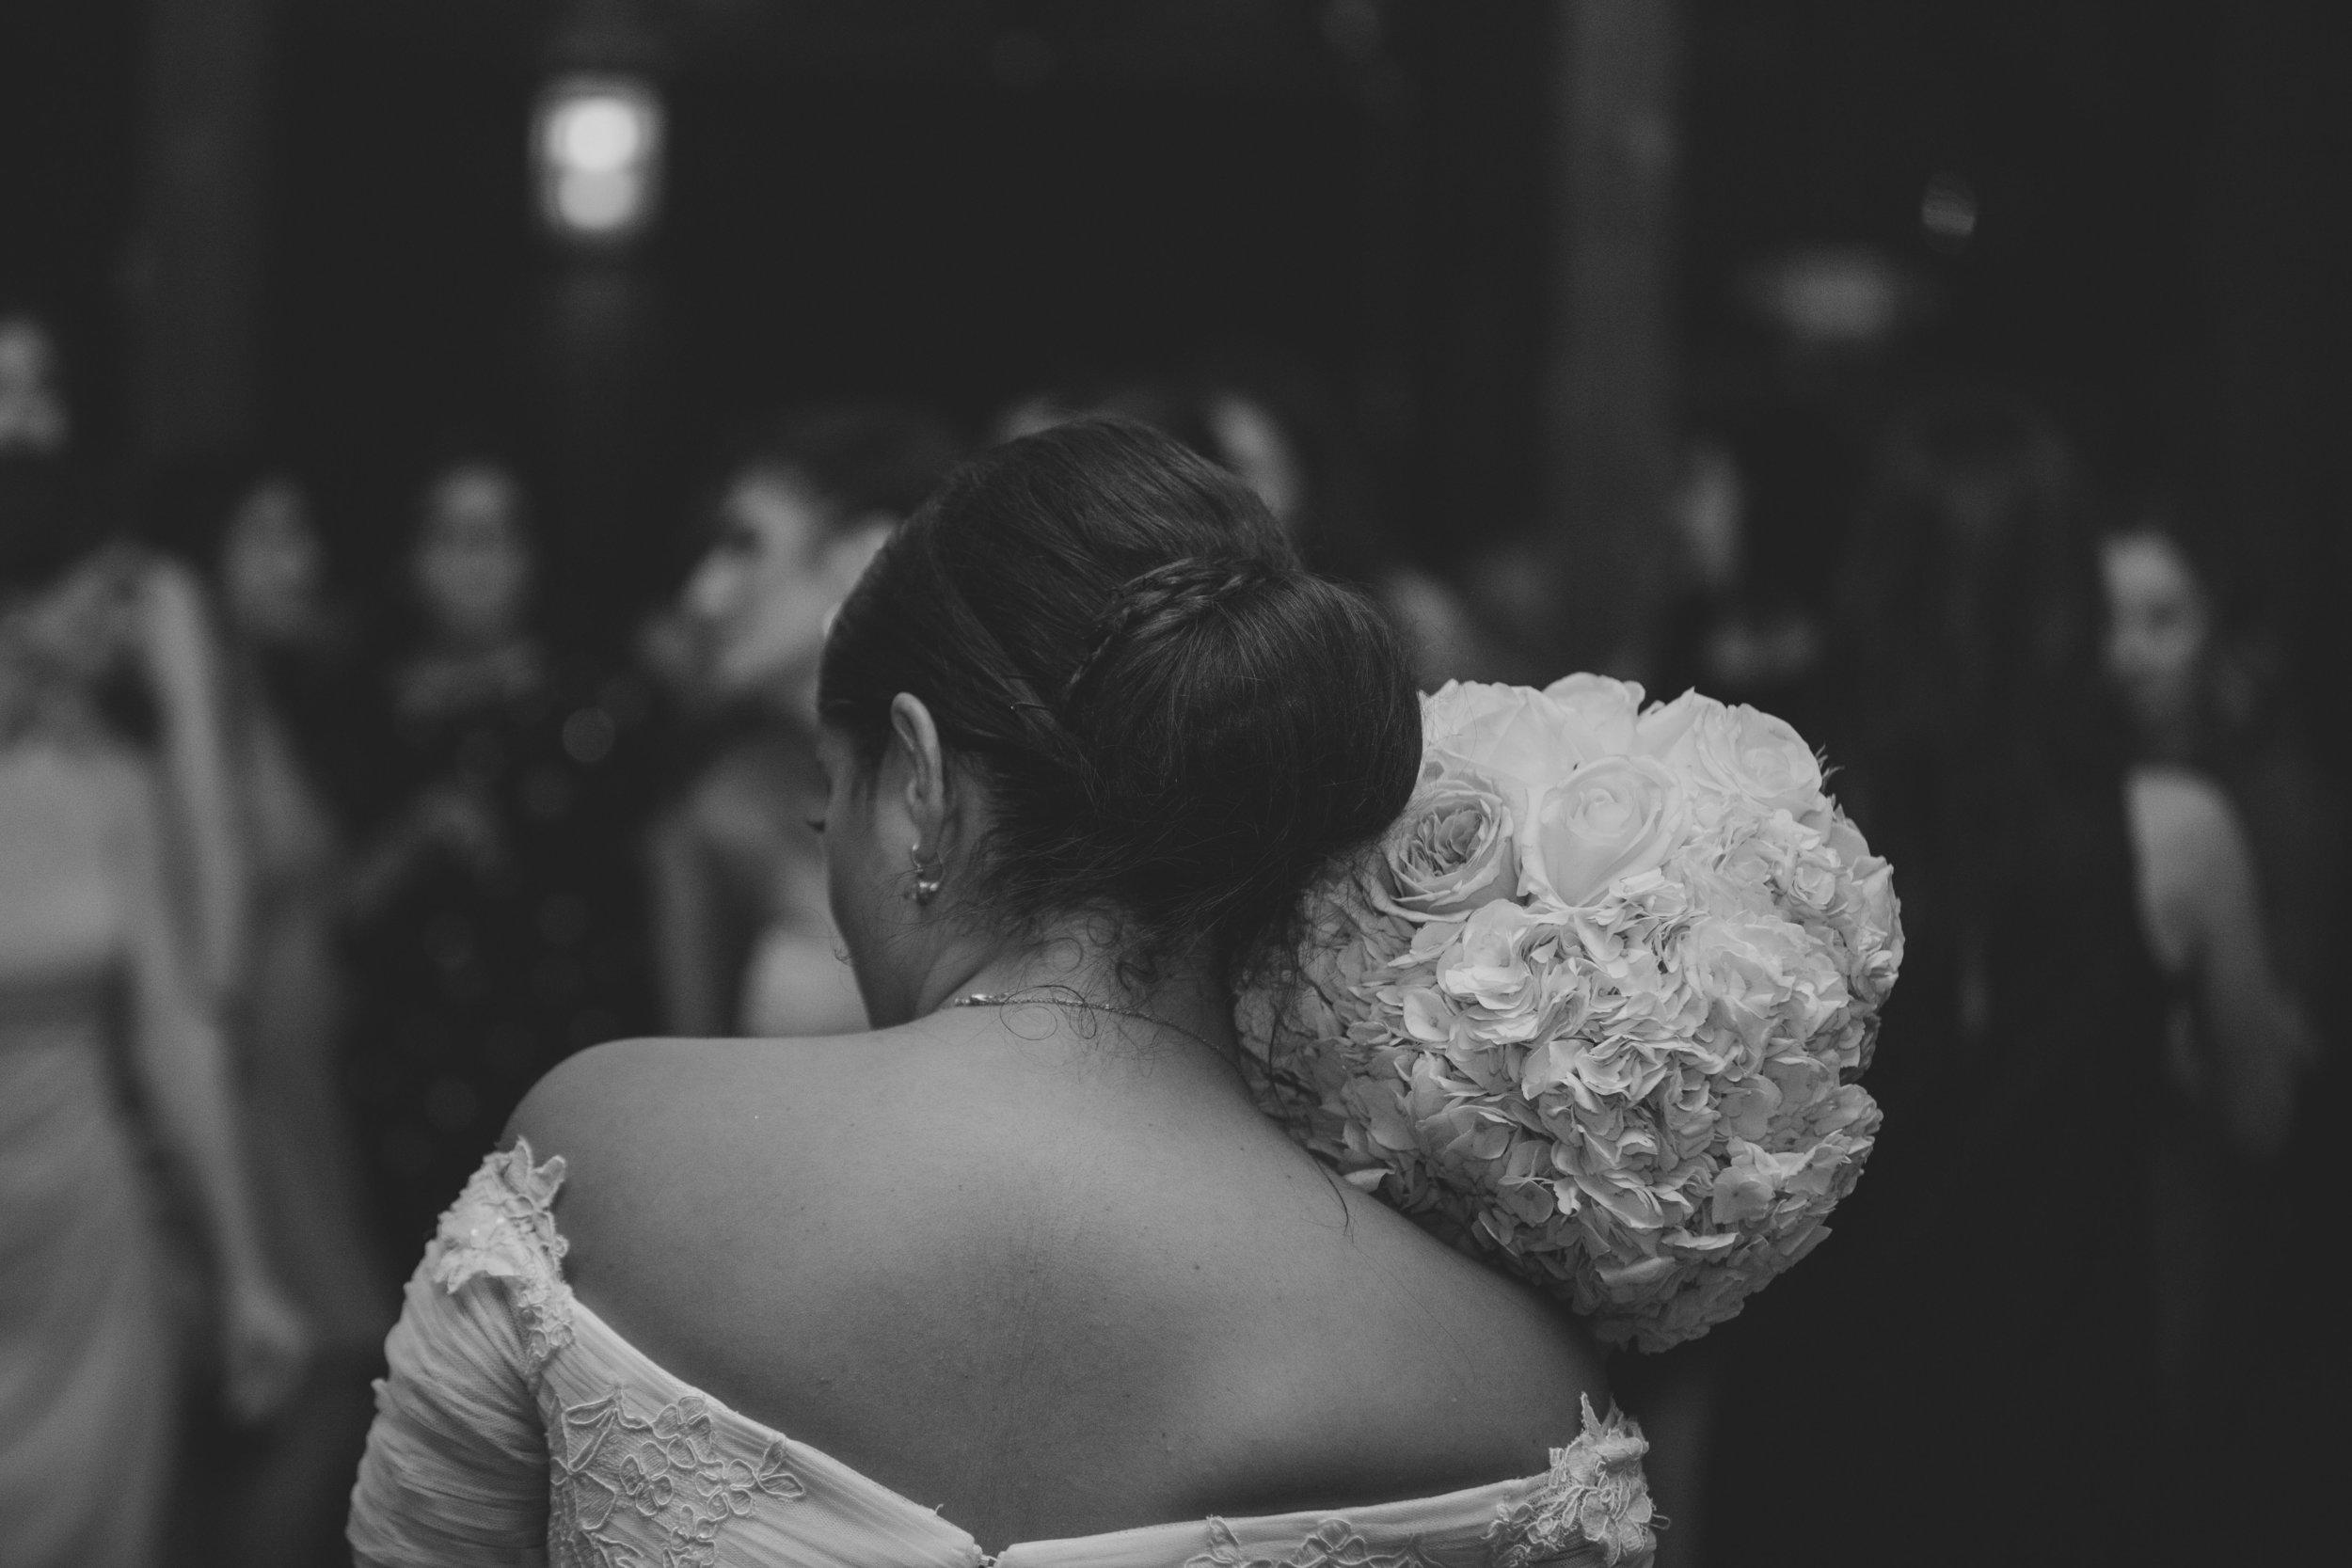 ATGI_Magali & Josh Wedding1_2S8A2503.jpg